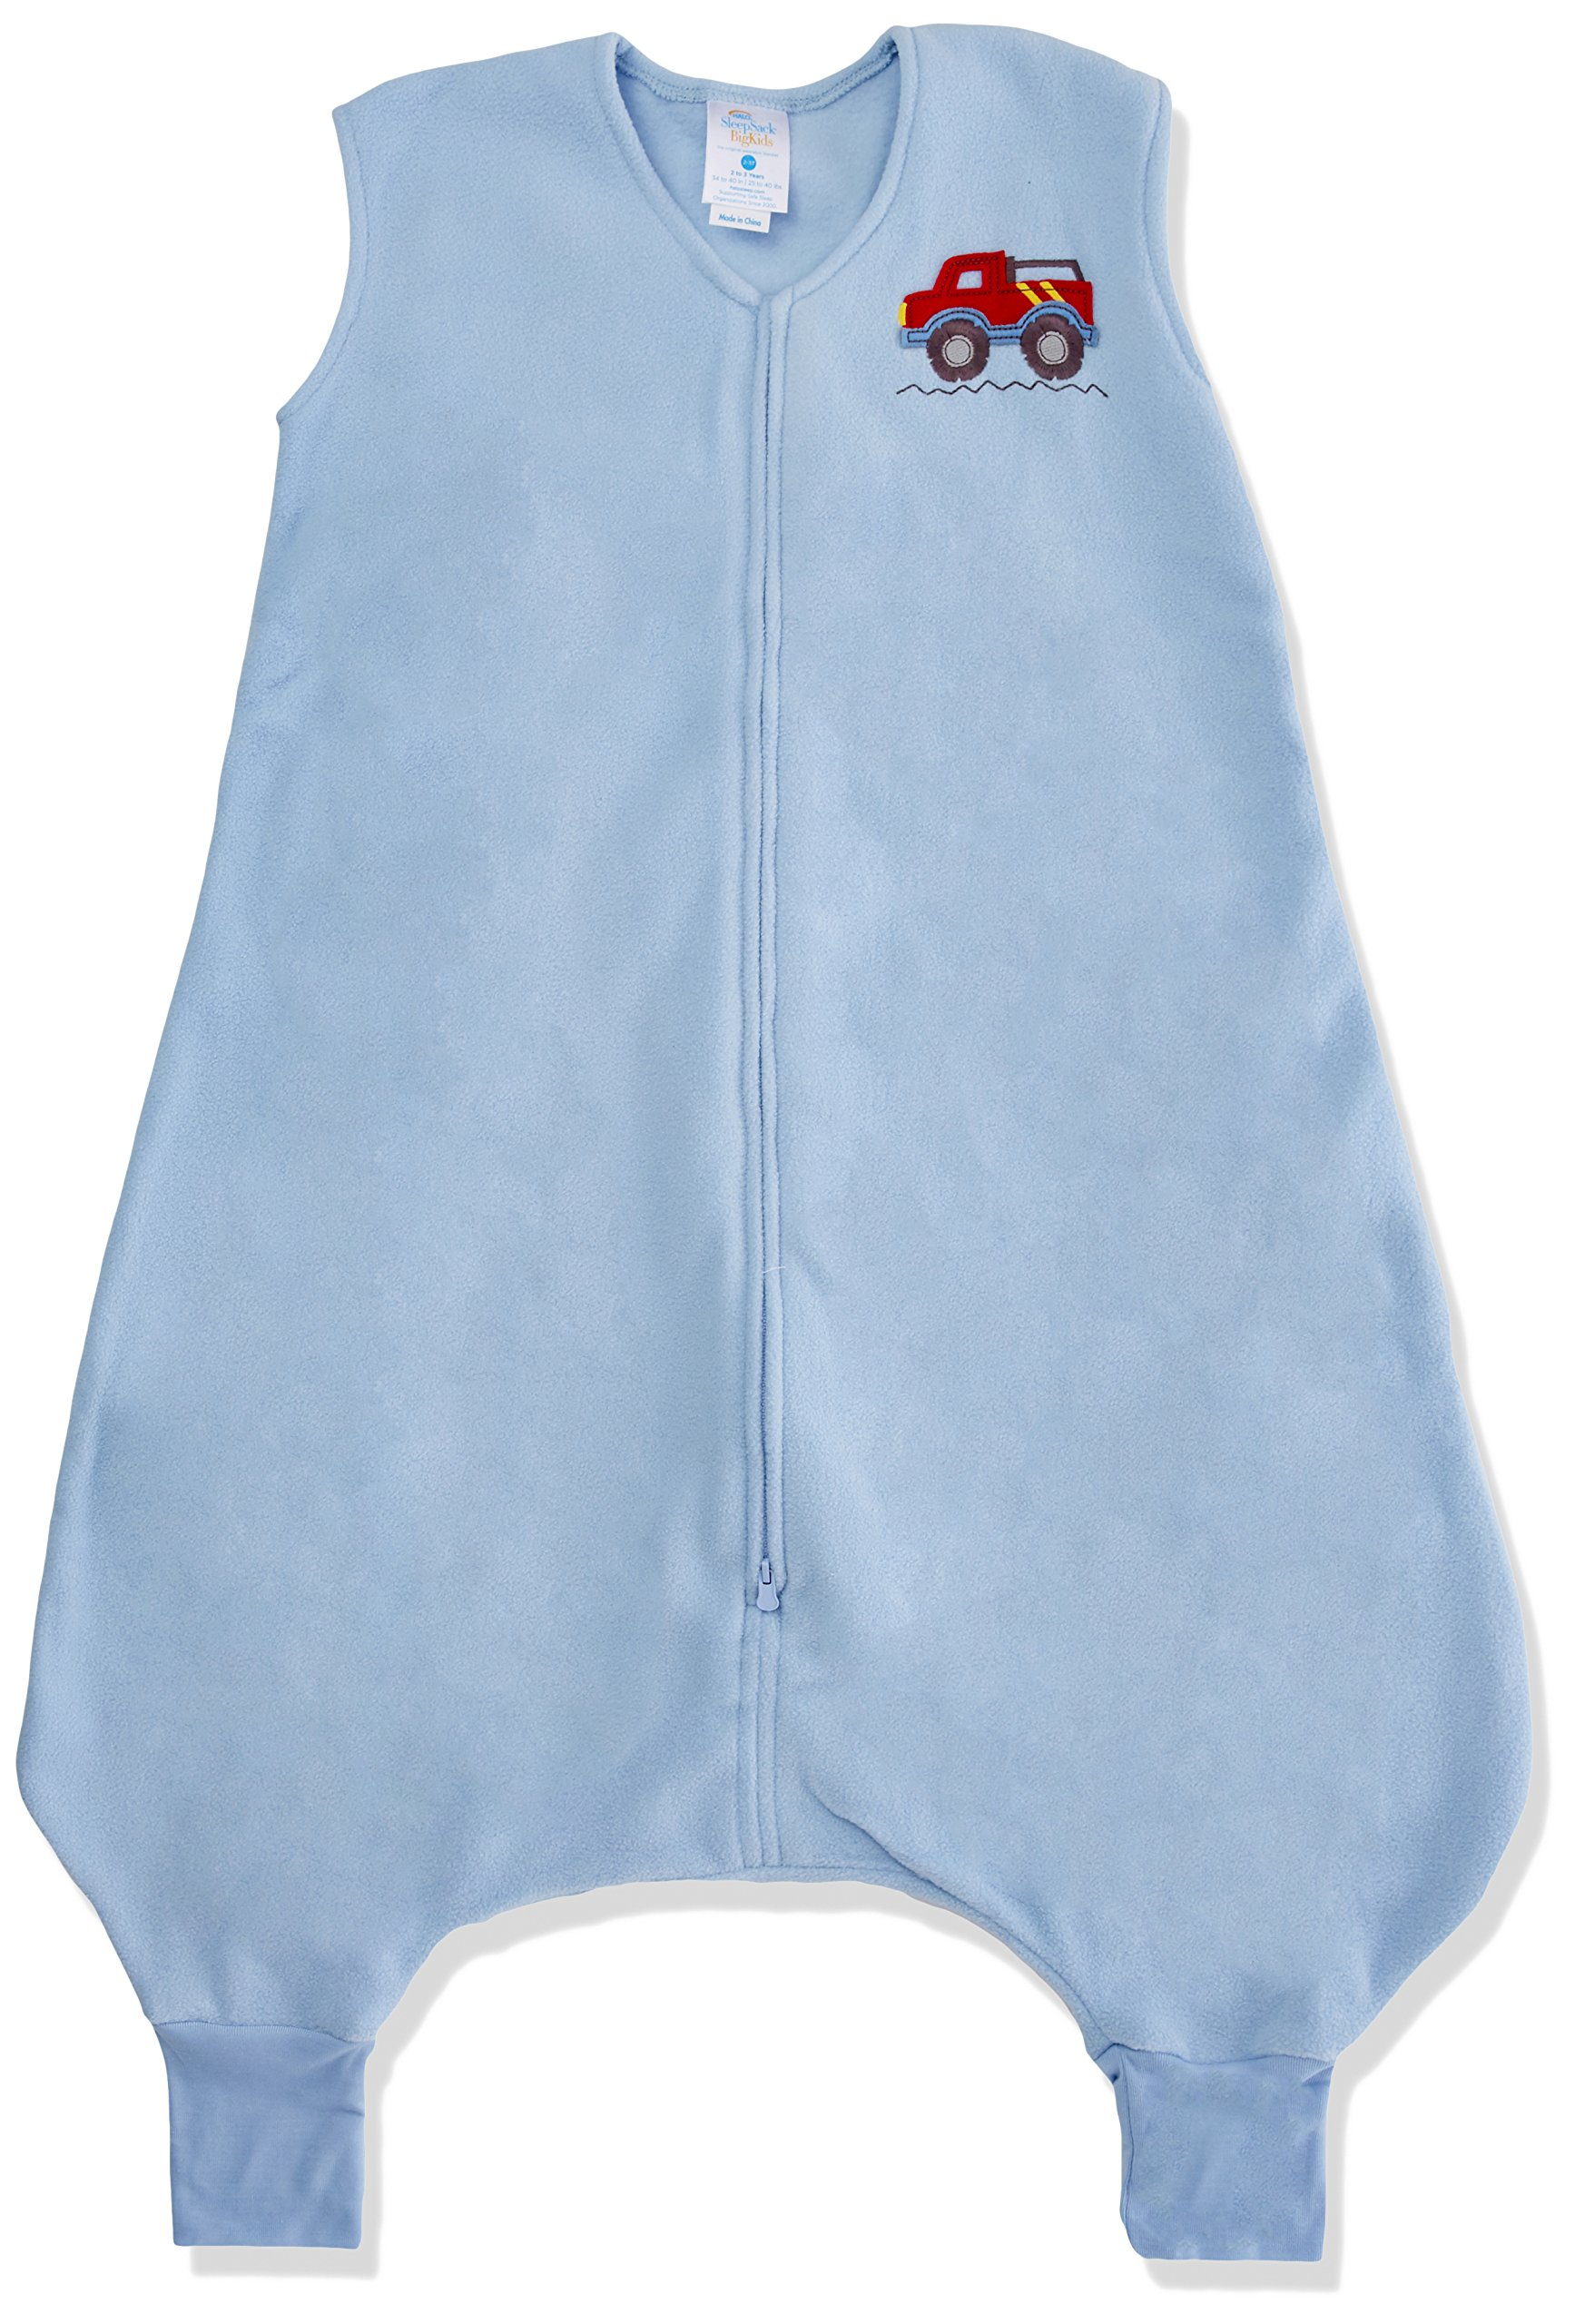 a82cbba89 Amazon.com  HALO Big Kids Sleepsack Lightweight Knit Wearable ...